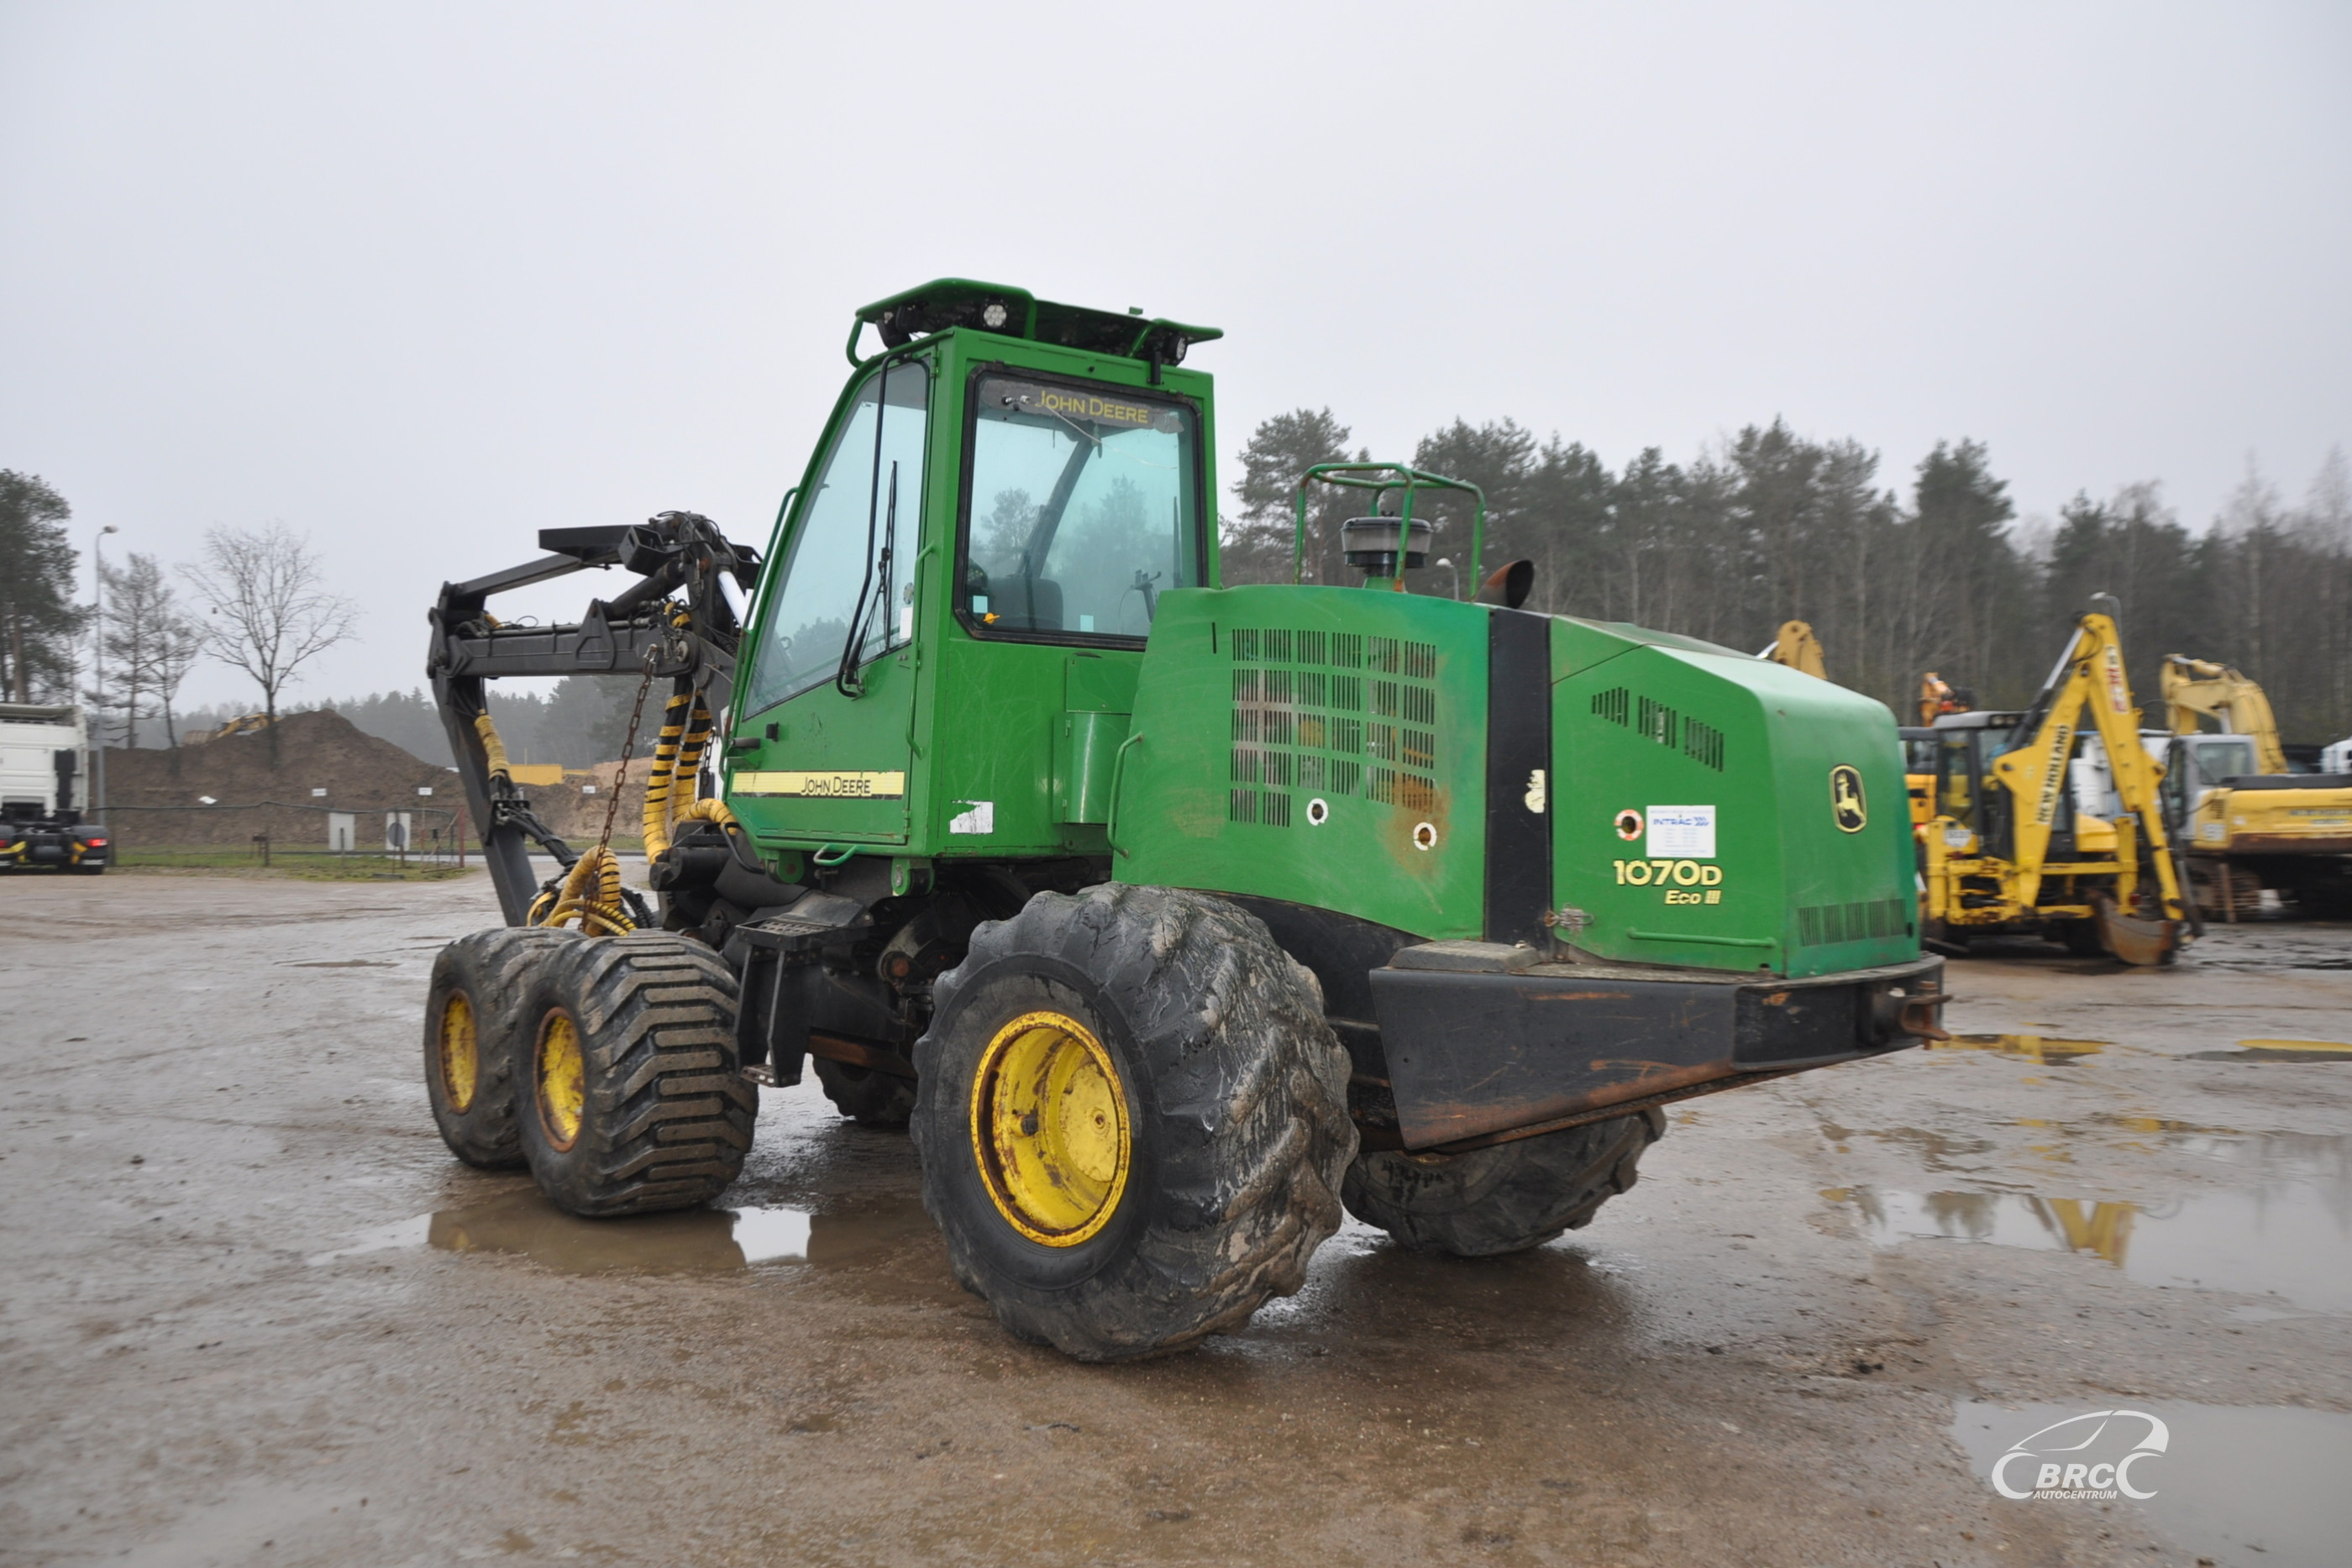 John Deere 1070 D, H754 2011